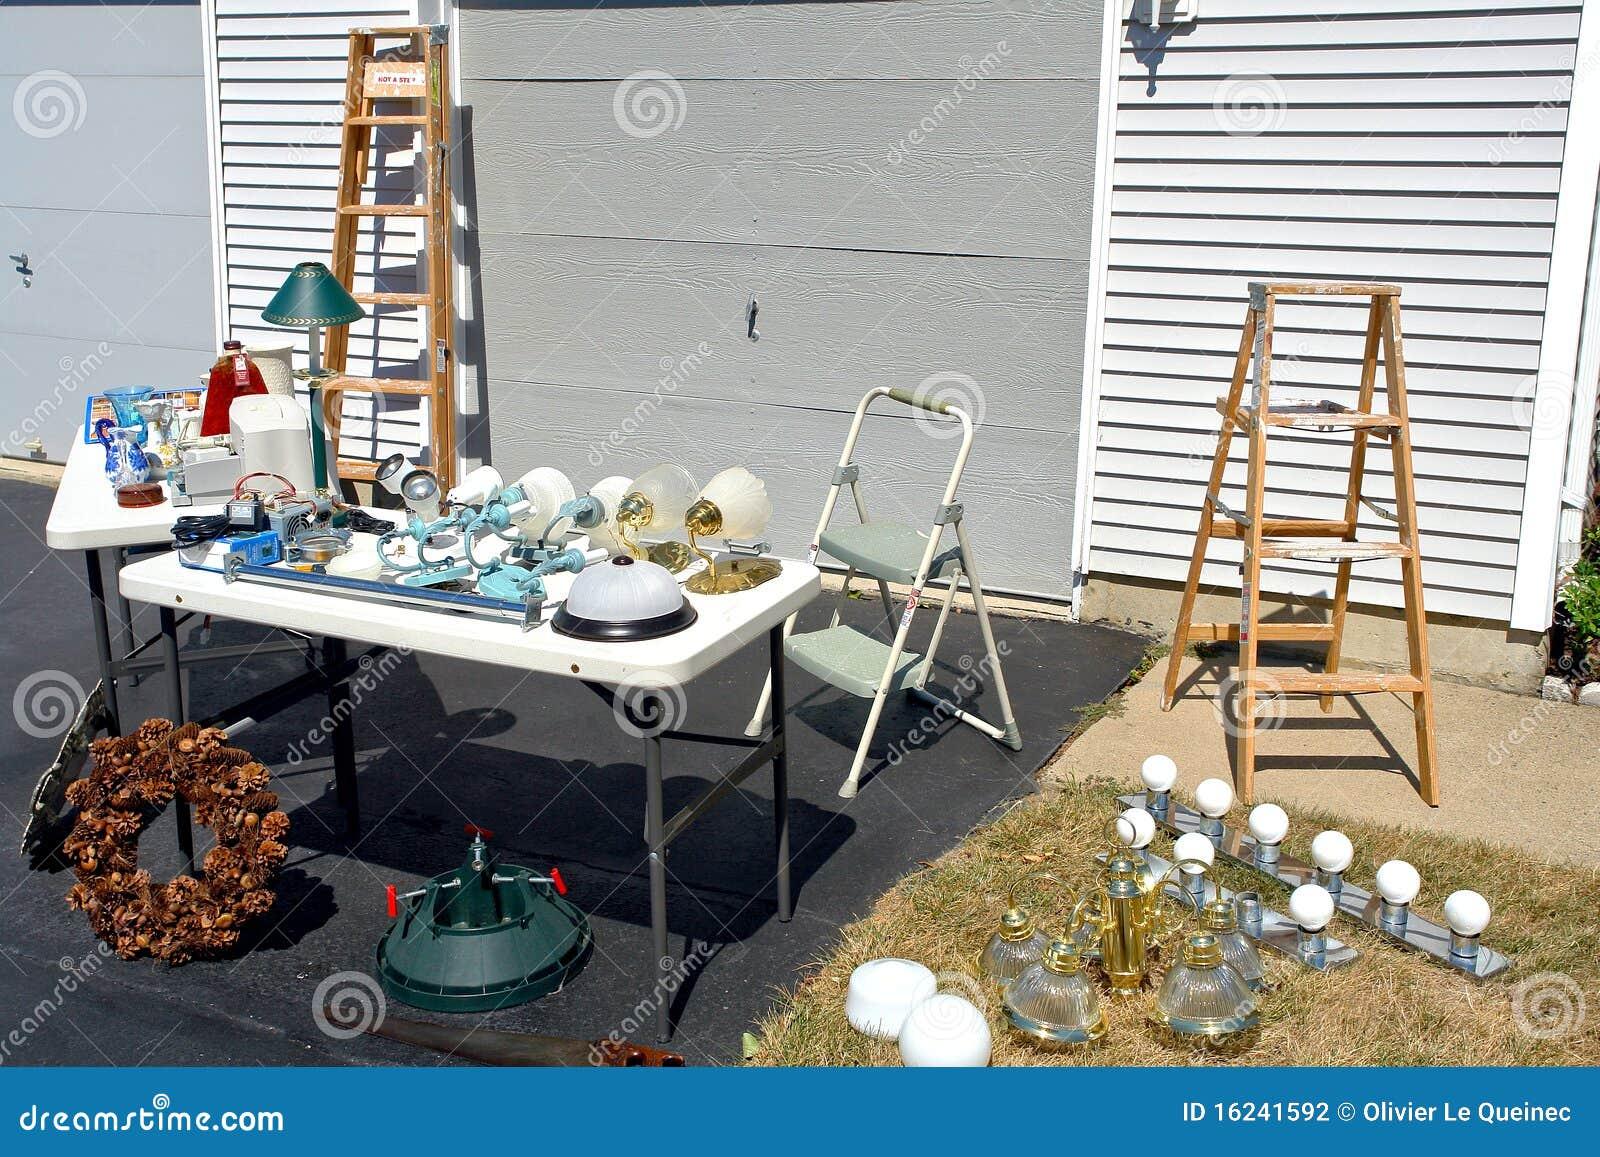 Garage Sale in Suburban House Driveway and Yard